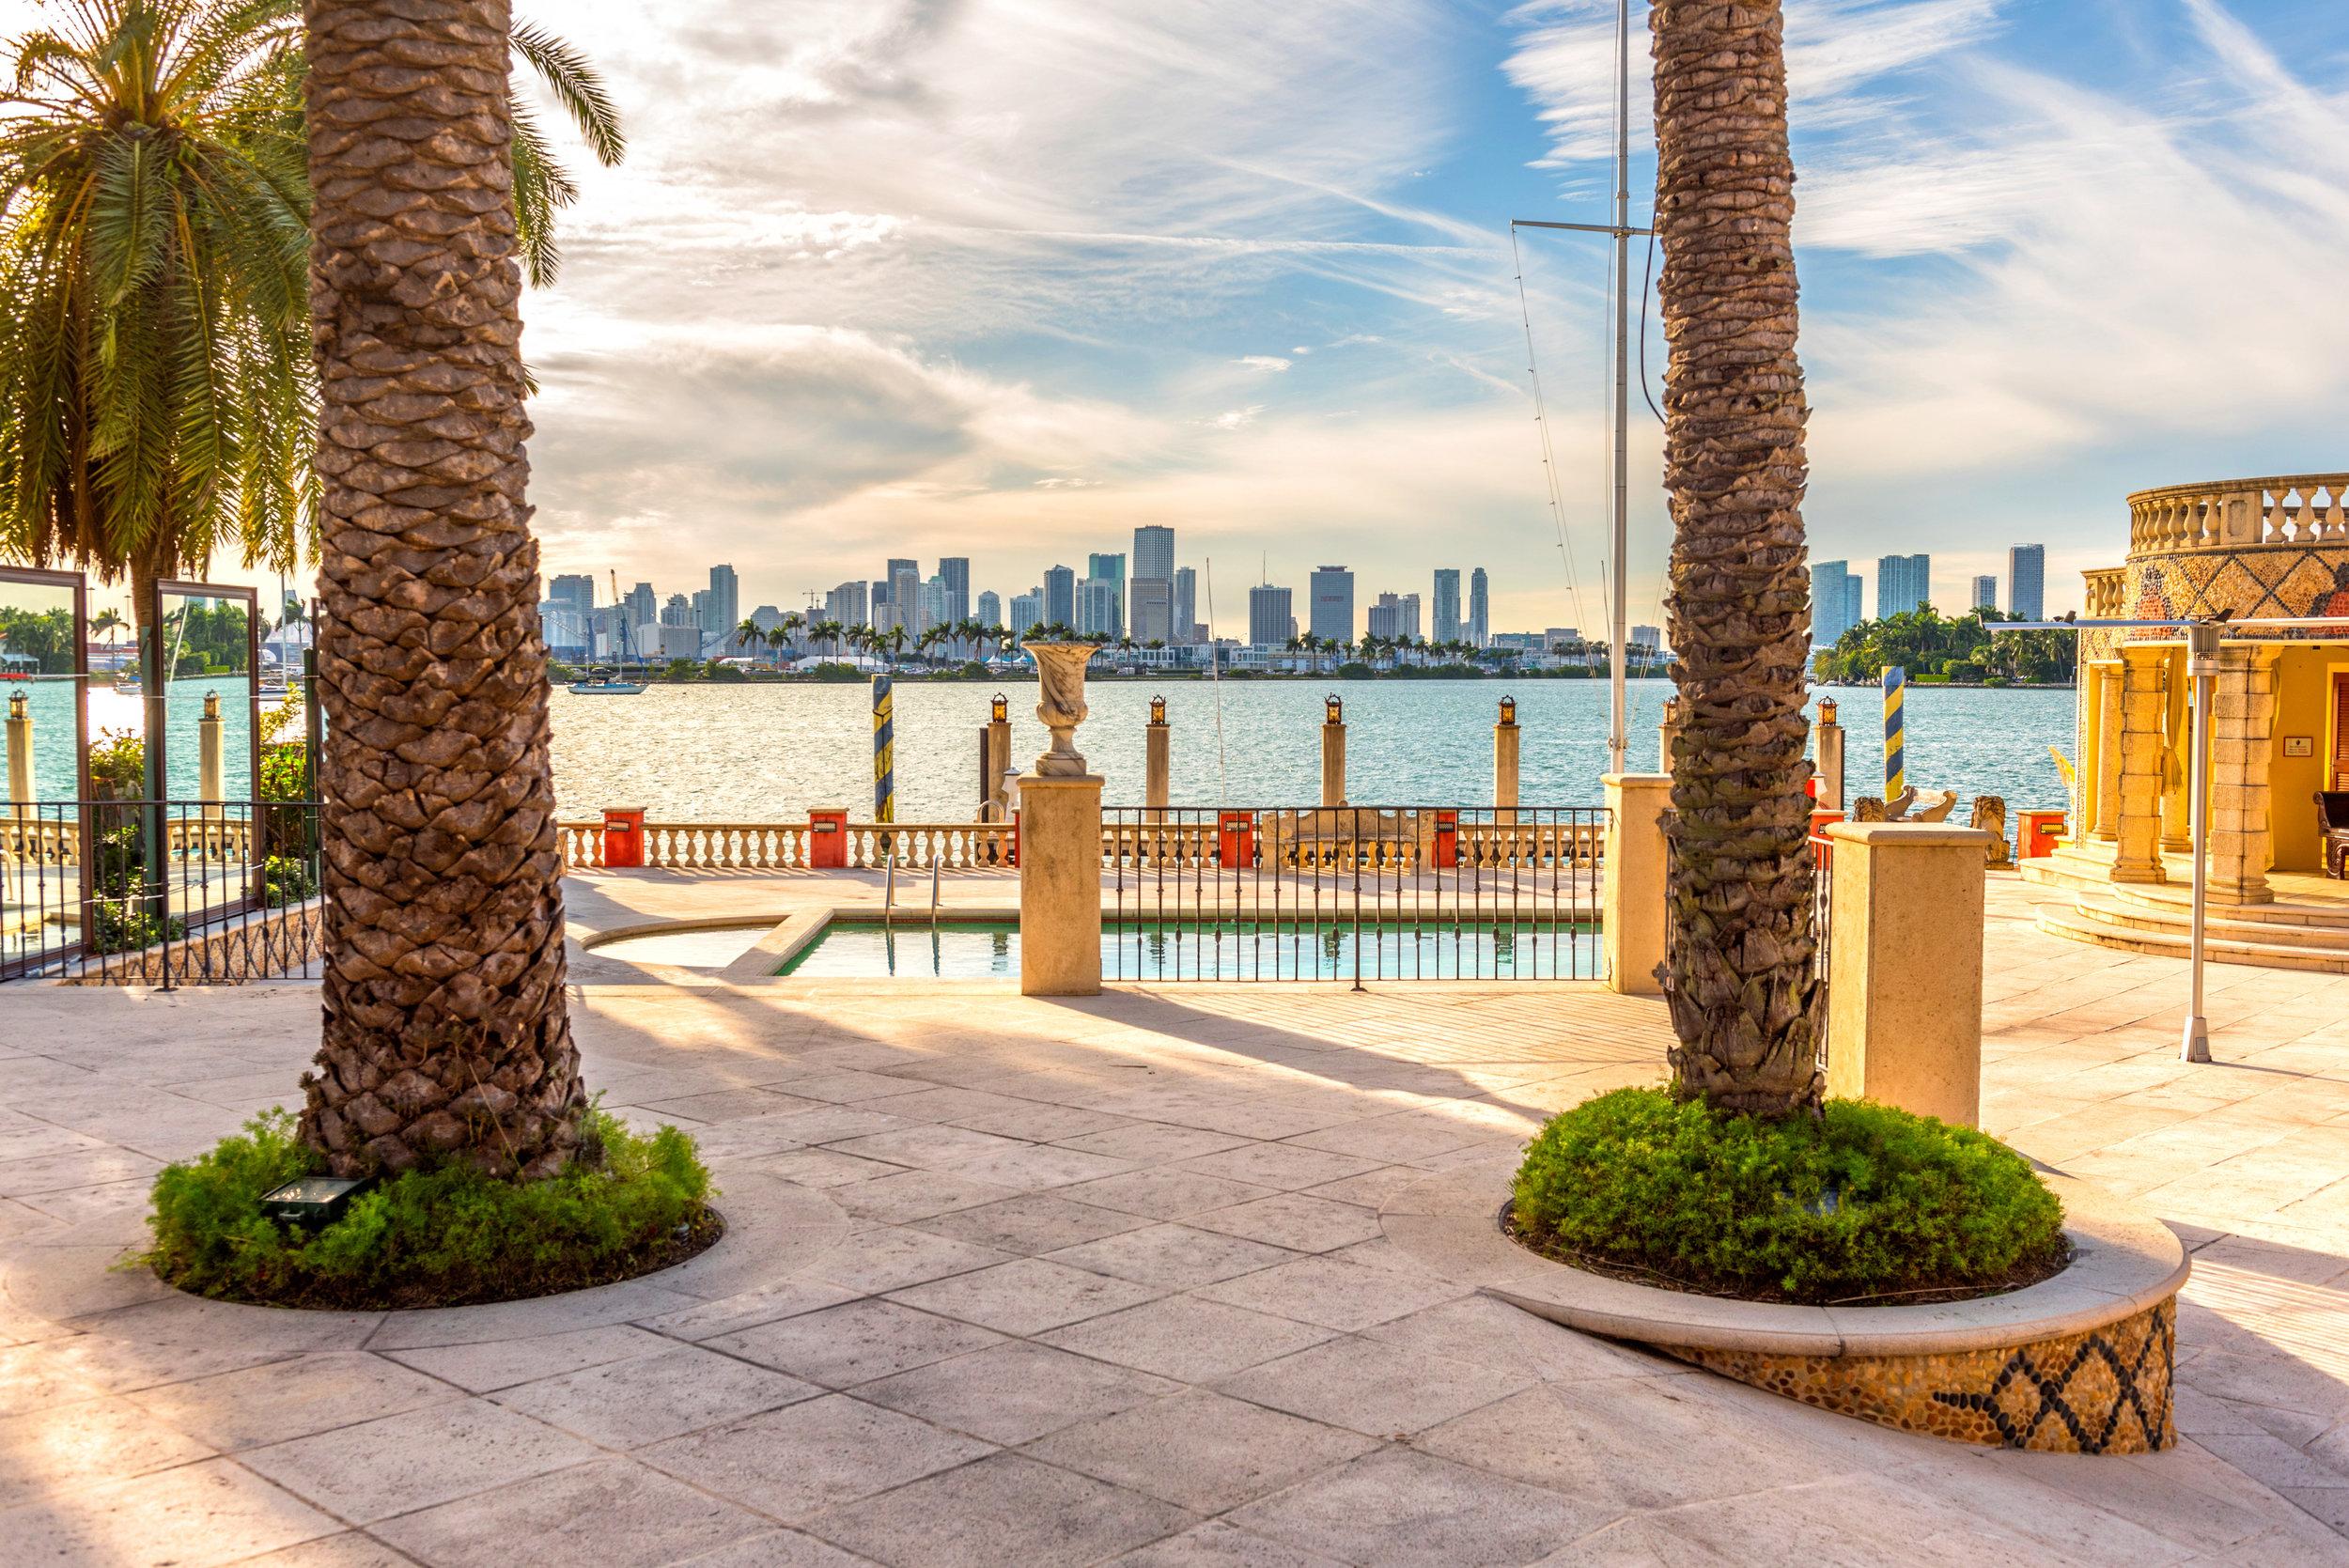 Tour 5 Star Island, The Legendary Former Estate of South Beach Icon, Developer & Playboy Thomas Kramer Now Listed For $40 Million